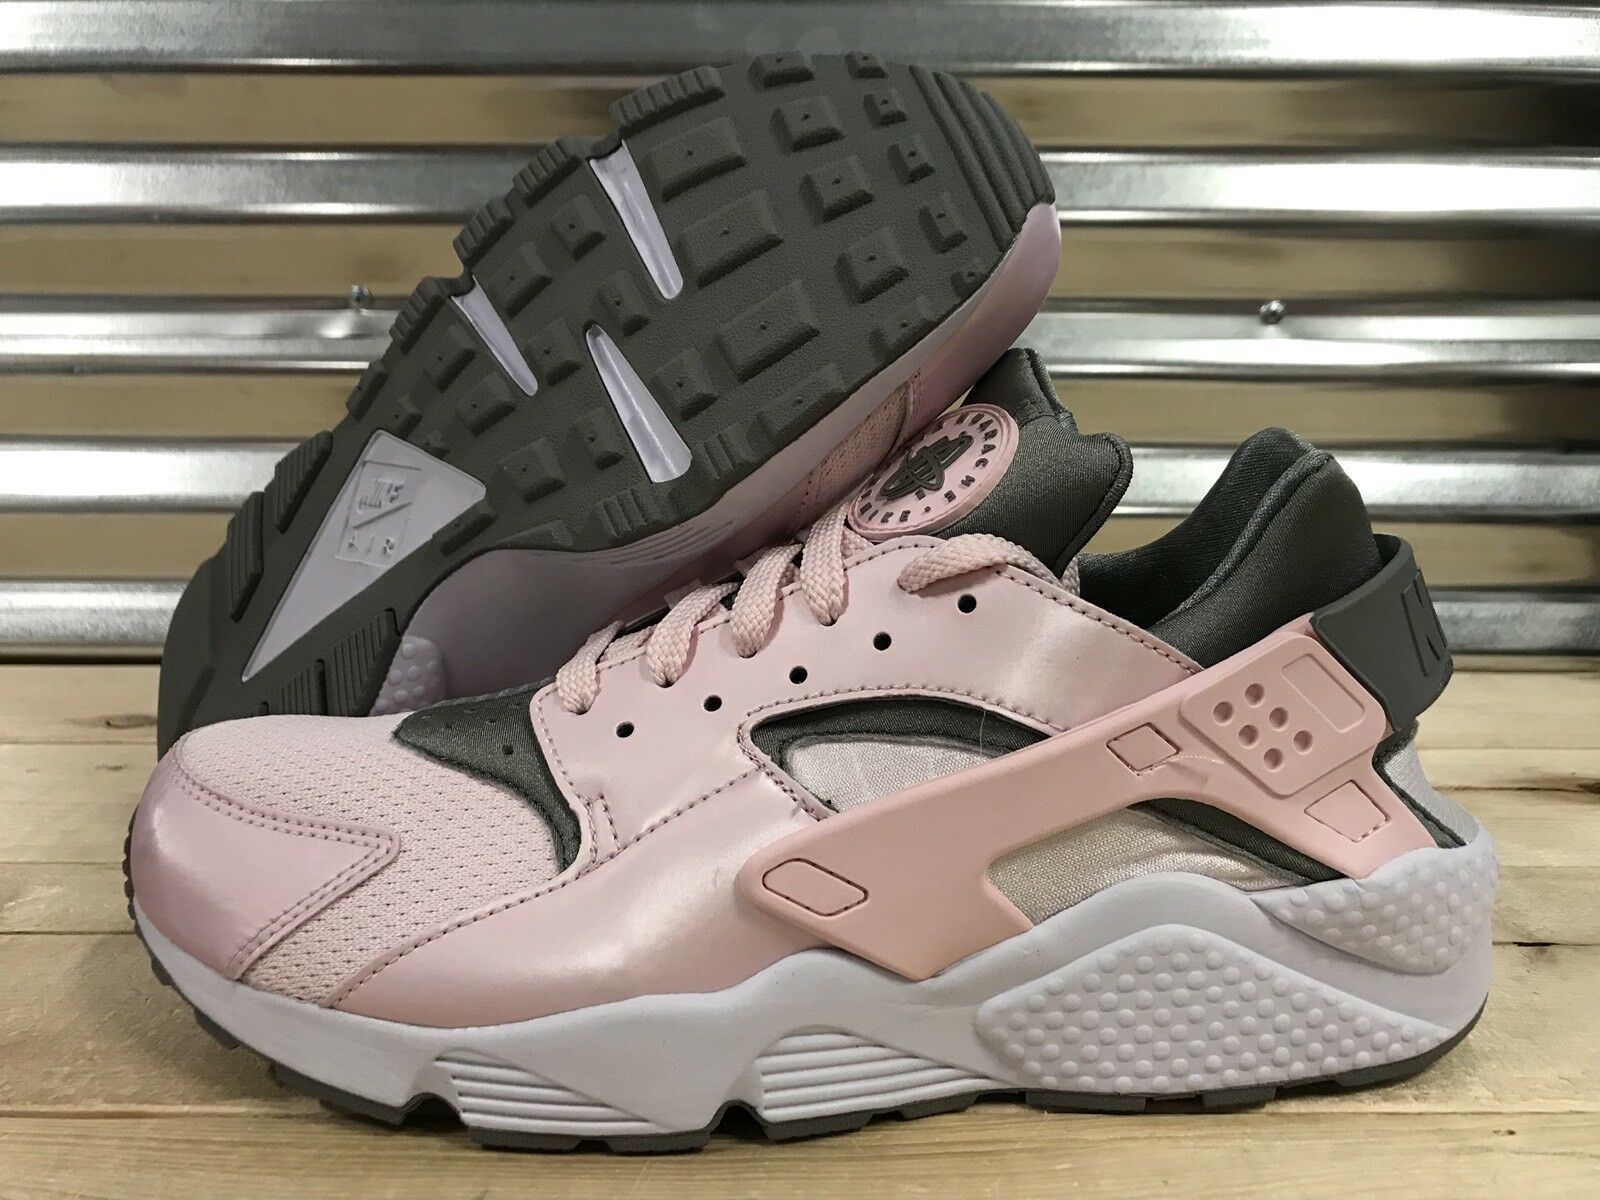 Nike air huarache scarpette rosa polveroso bianco artico sz 11 (698902-006)